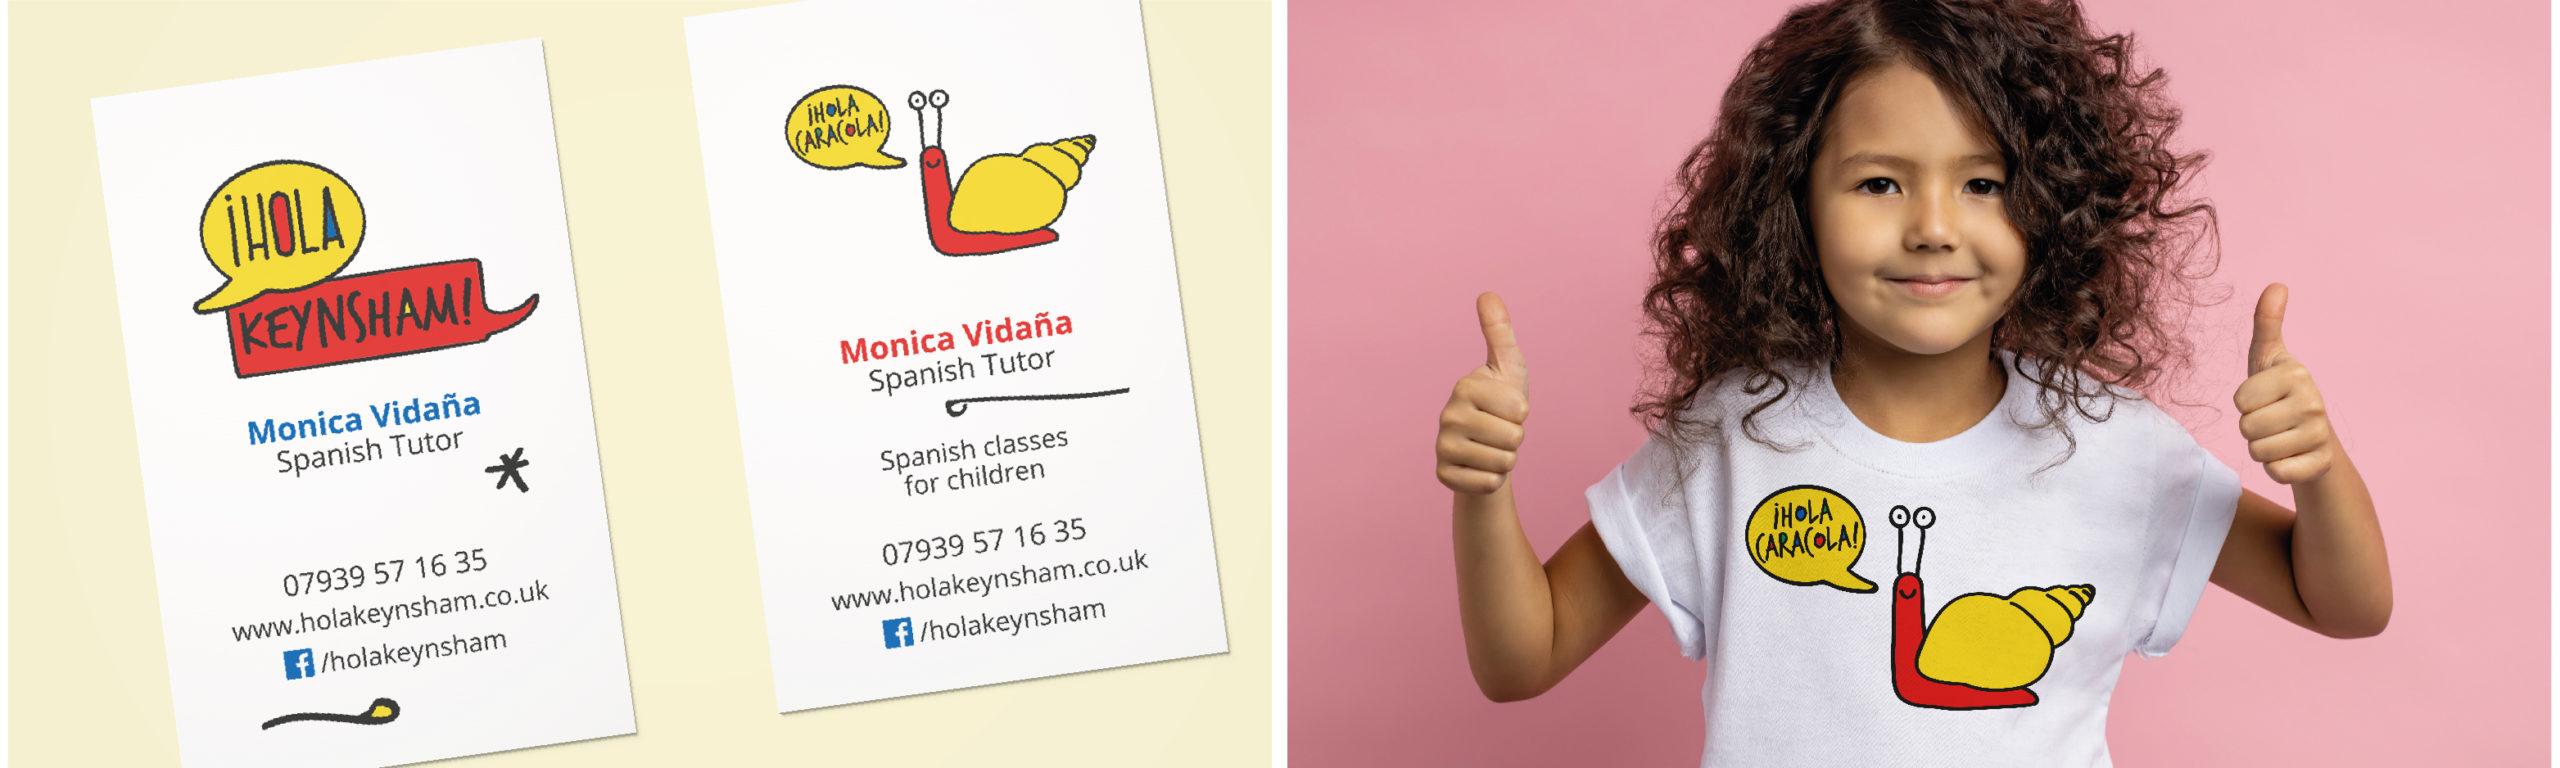 Hola Kaynsham, branding for a Spanish school